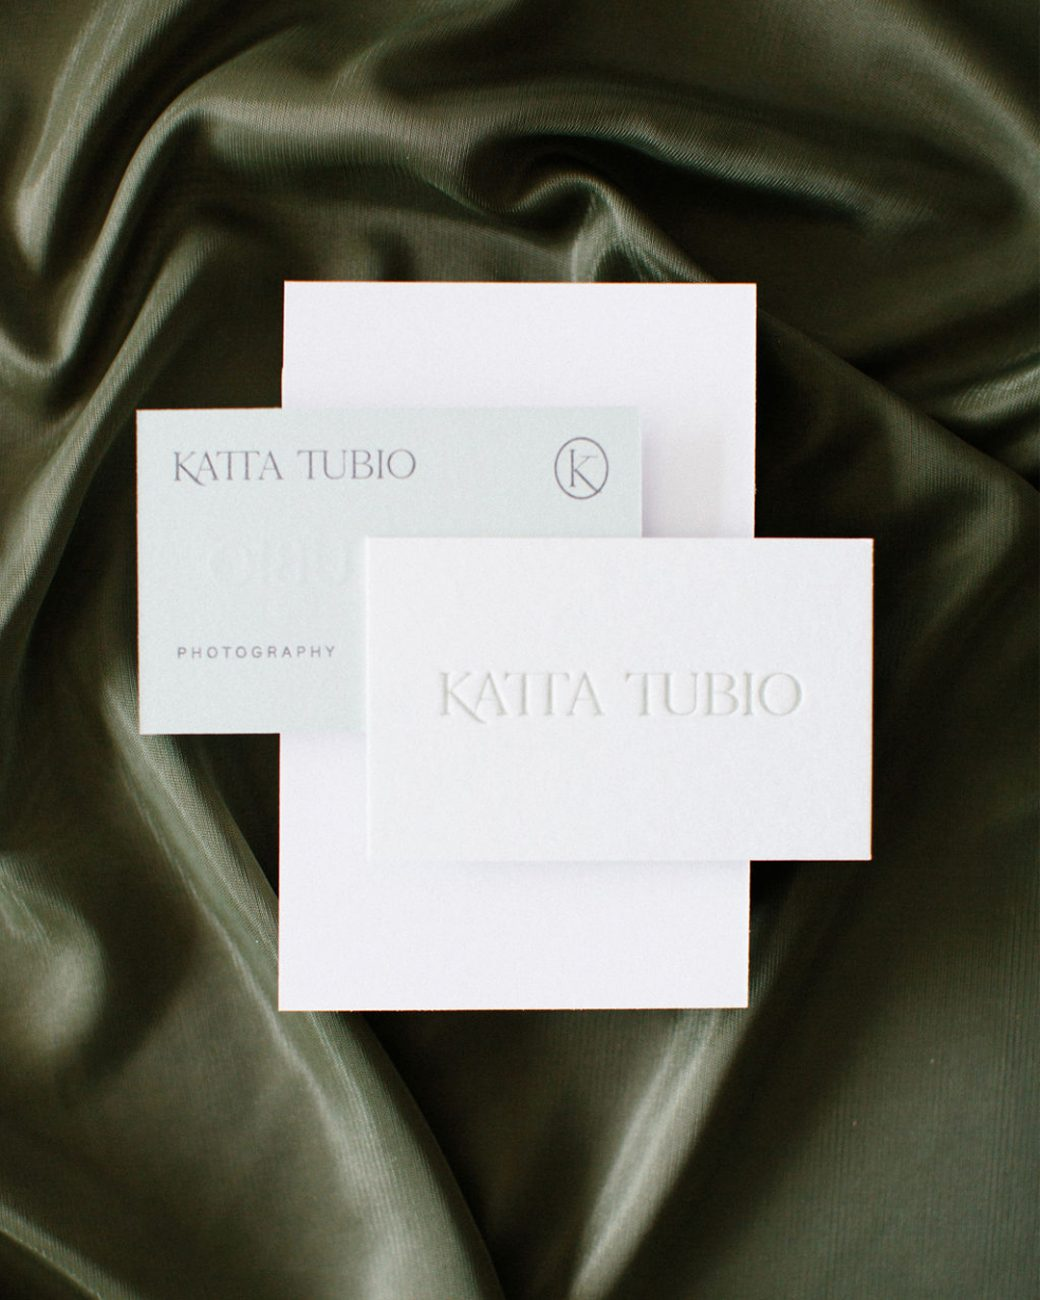 Katta Tubio mallorca photographer branding